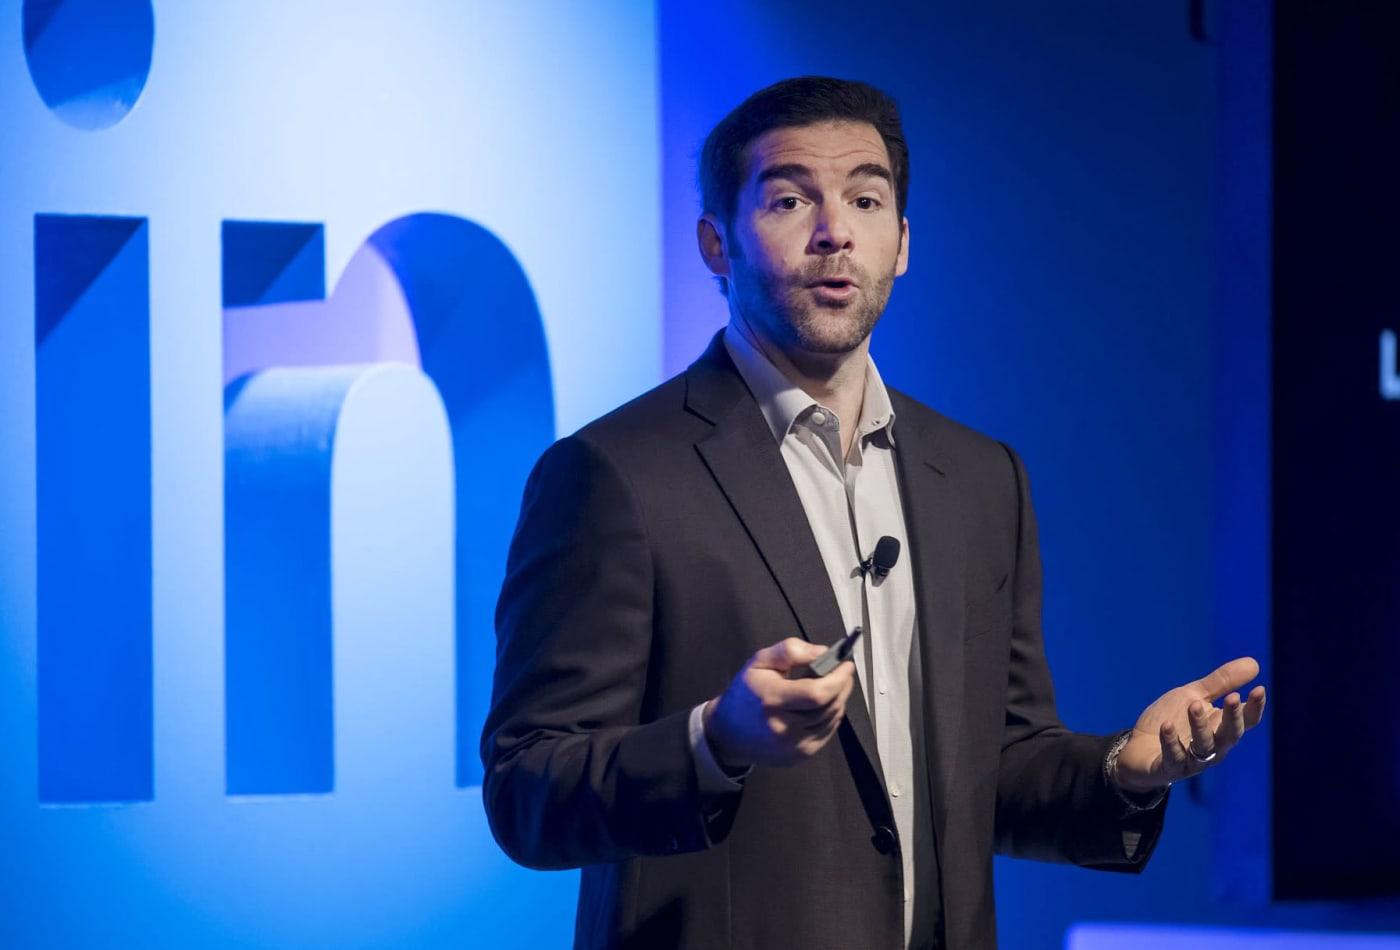 Linkedin Ceo The No 1 Job Skill American Employees Lack